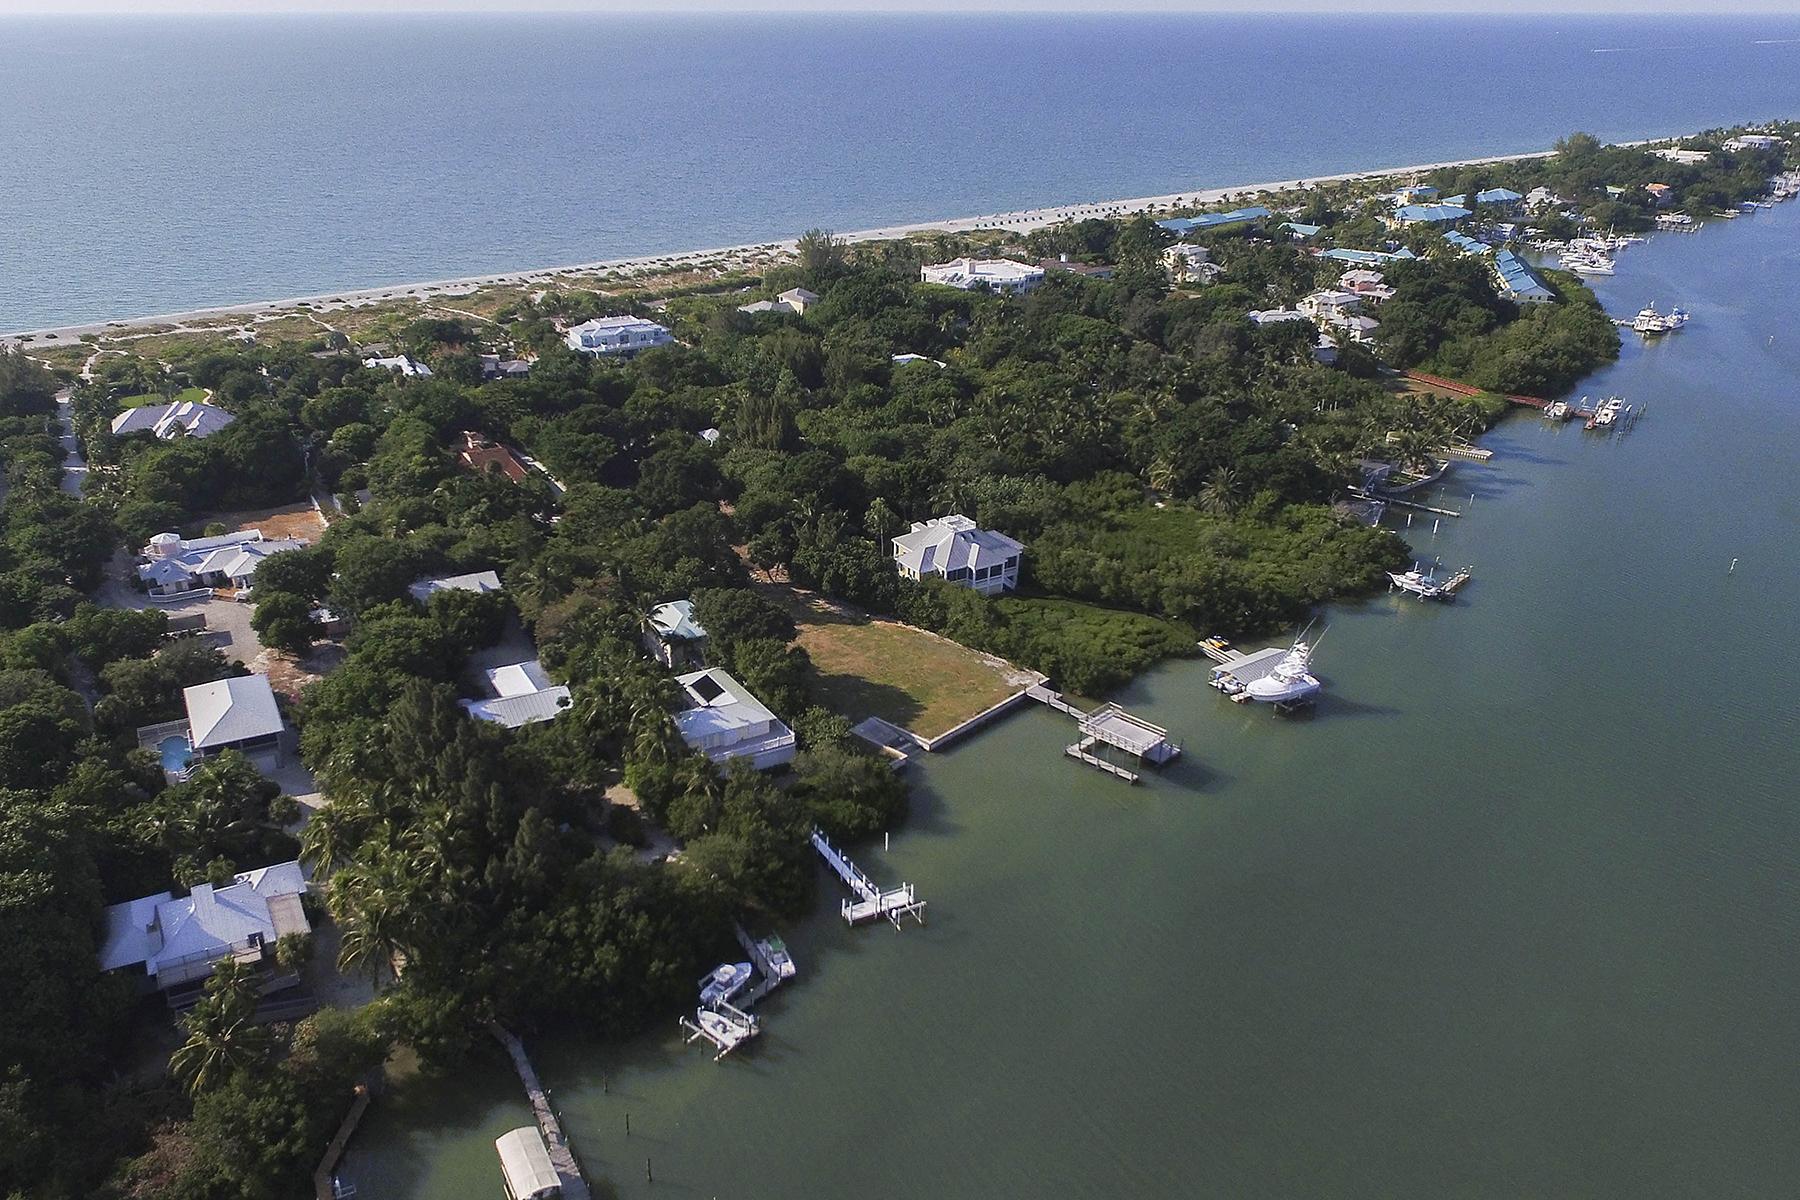 獨棟家庭住宅 為 出售 在 CAPTIVA 16181 Captiva Dr Captiva, 佛羅里達州, 33924 美國